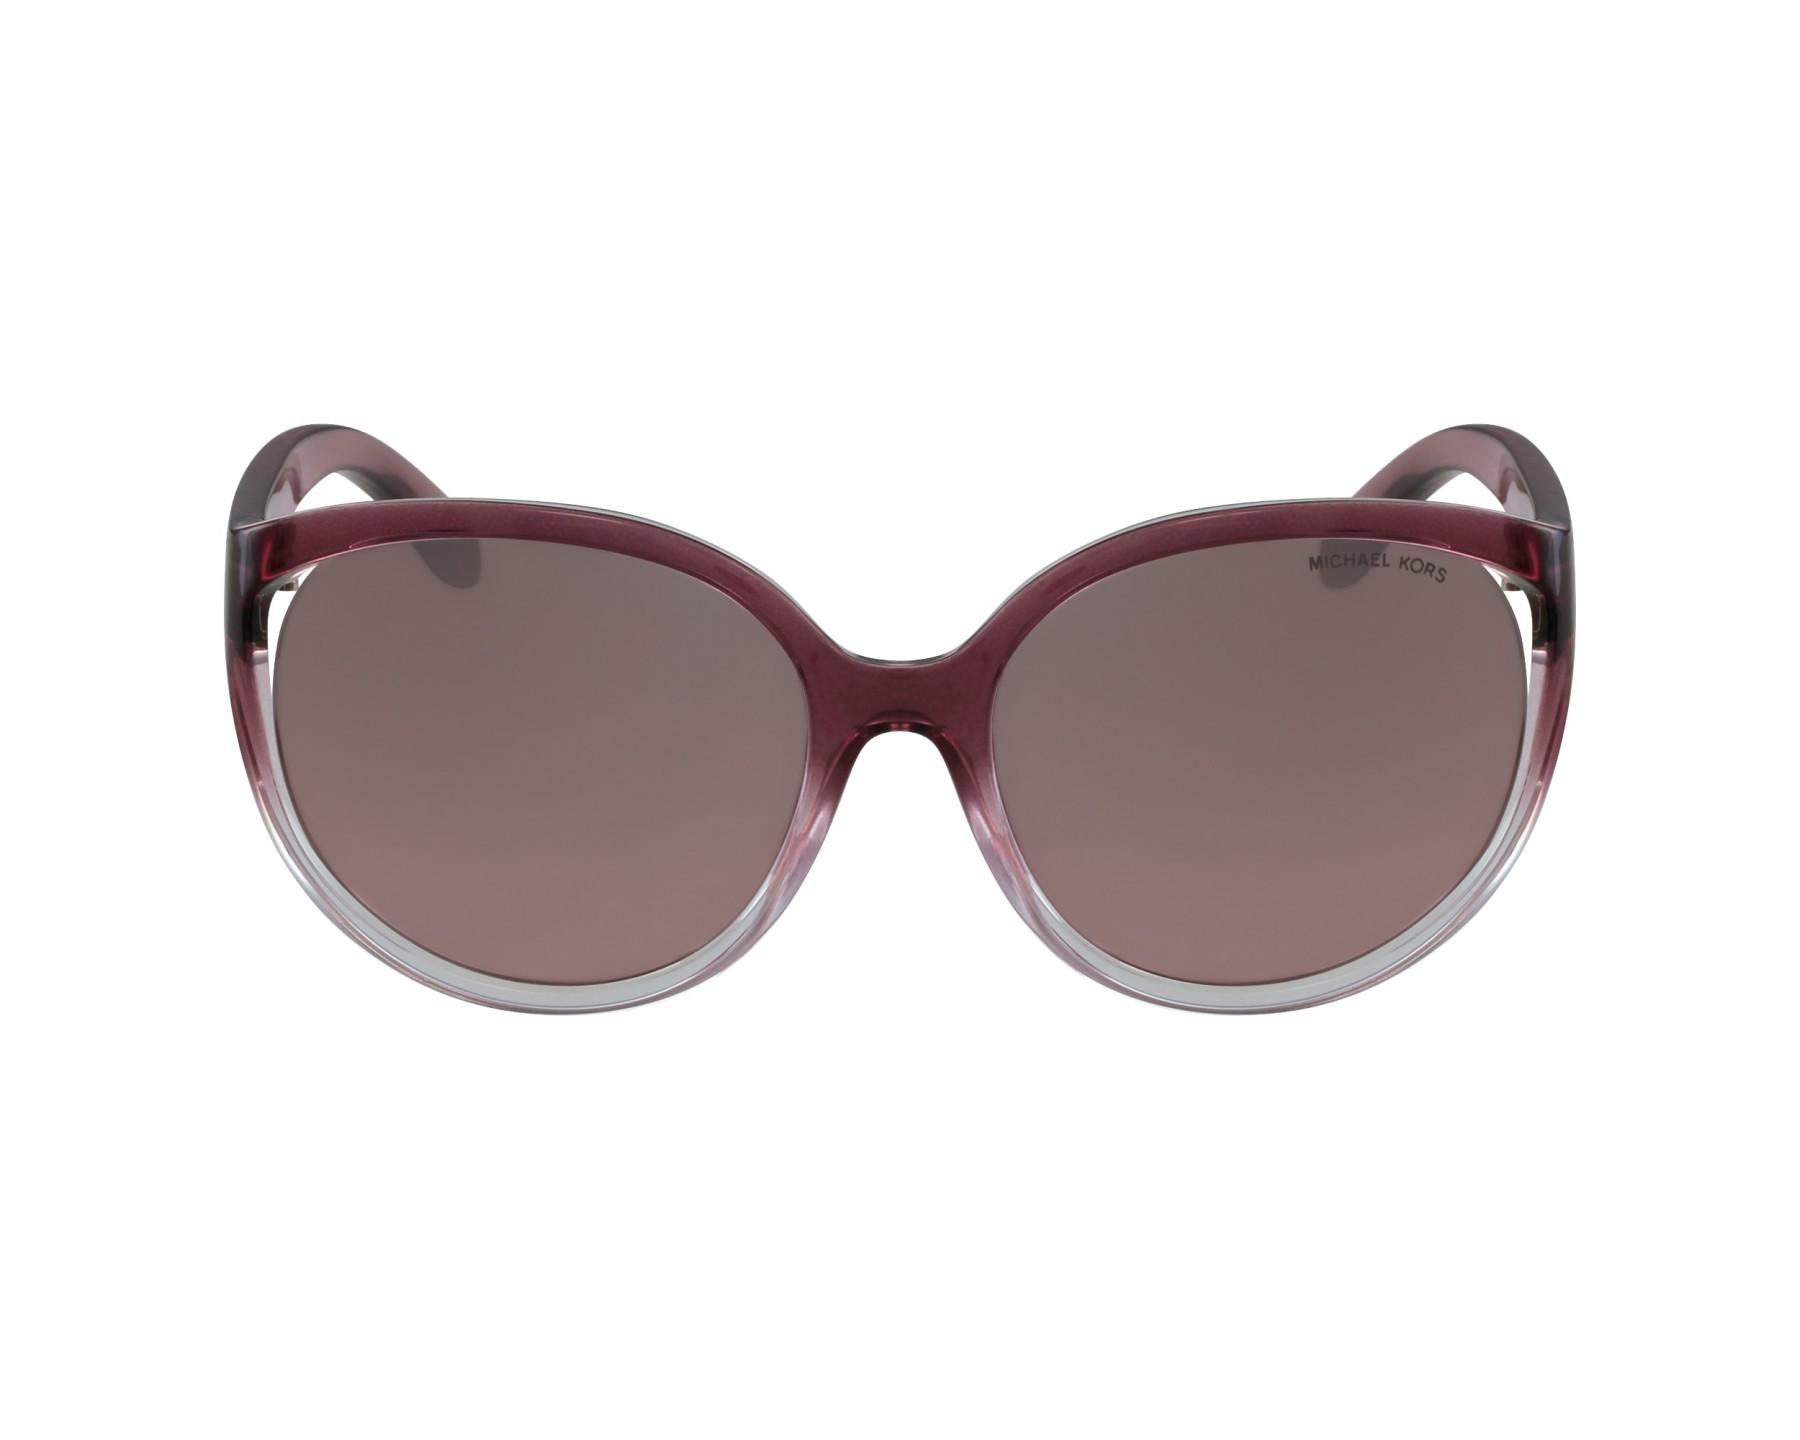 lunettes de soleil michael kors mk 6036 31287e violet pas cher visionet. Black Bedroom Furniture Sets. Home Design Ideas